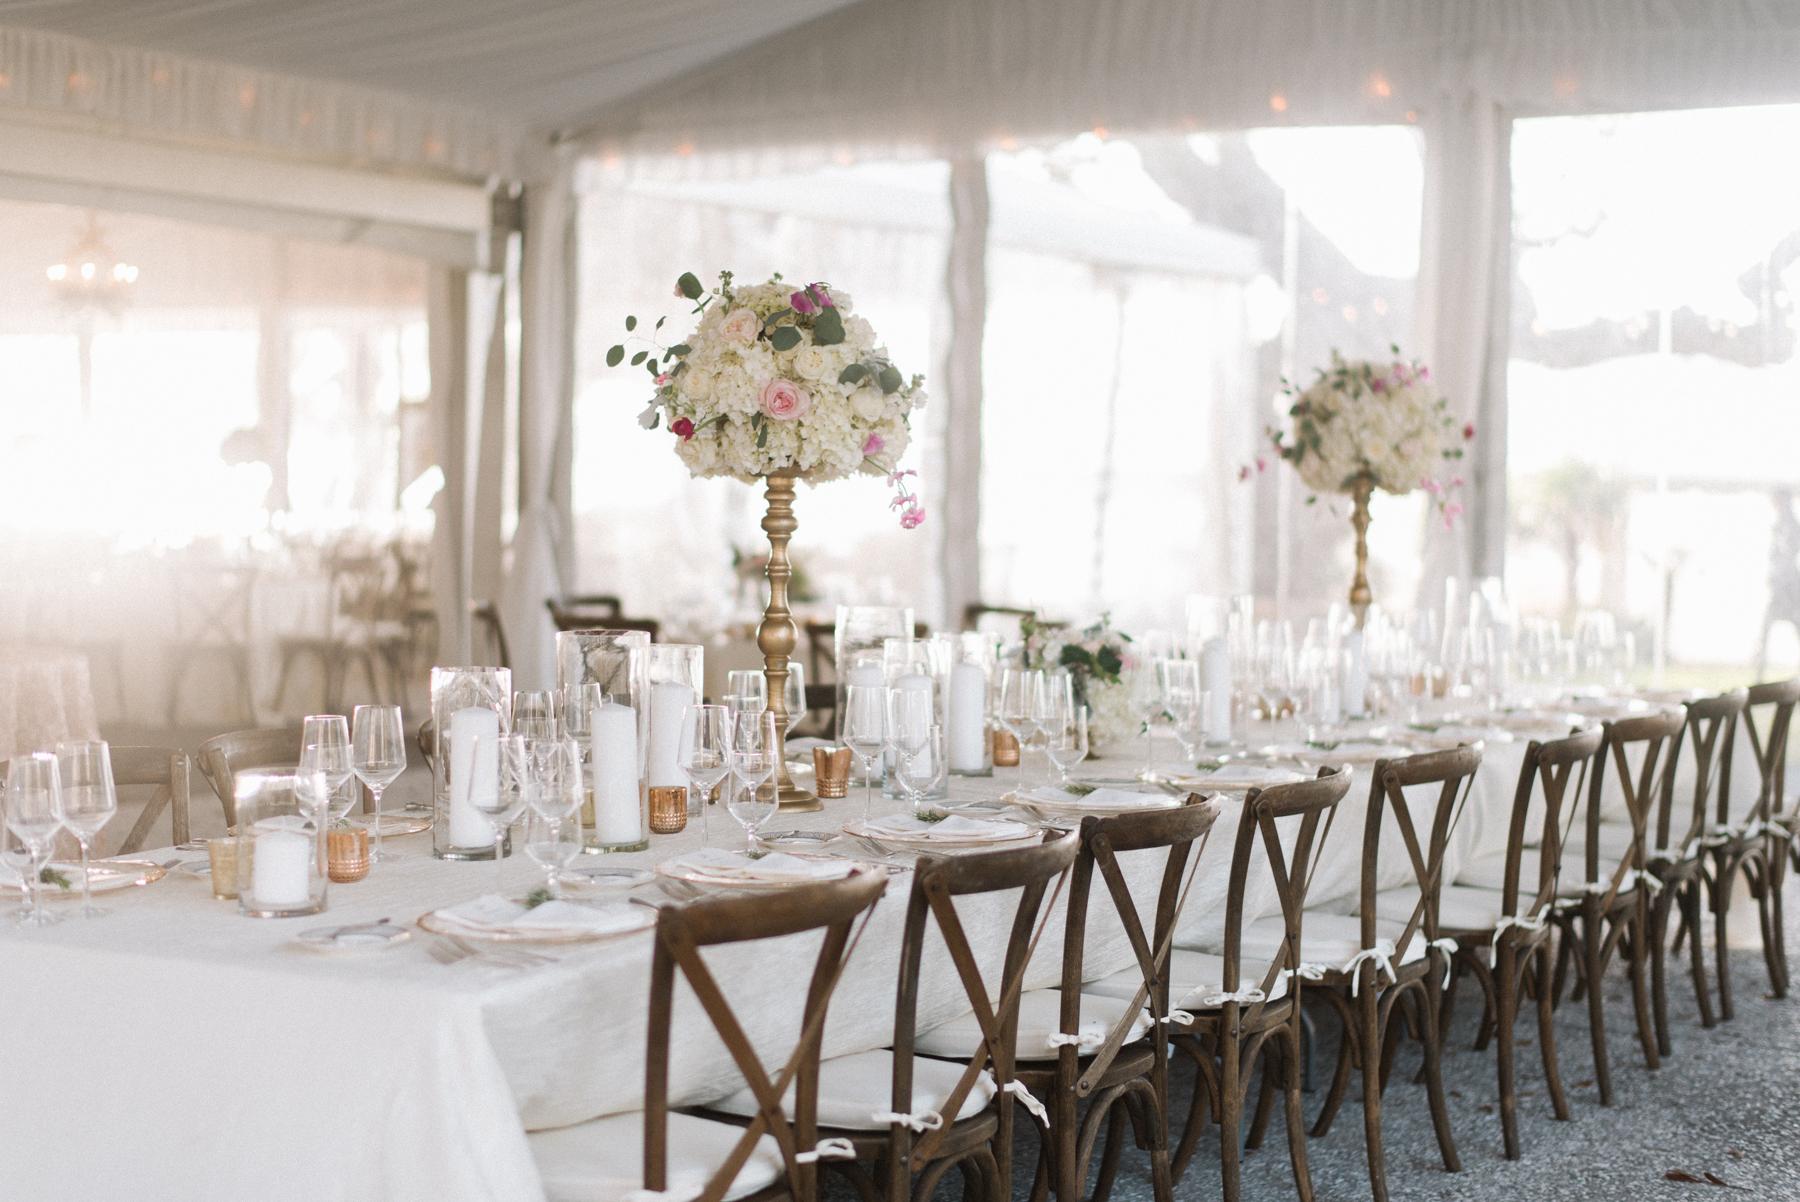 White Tent Wedding Table